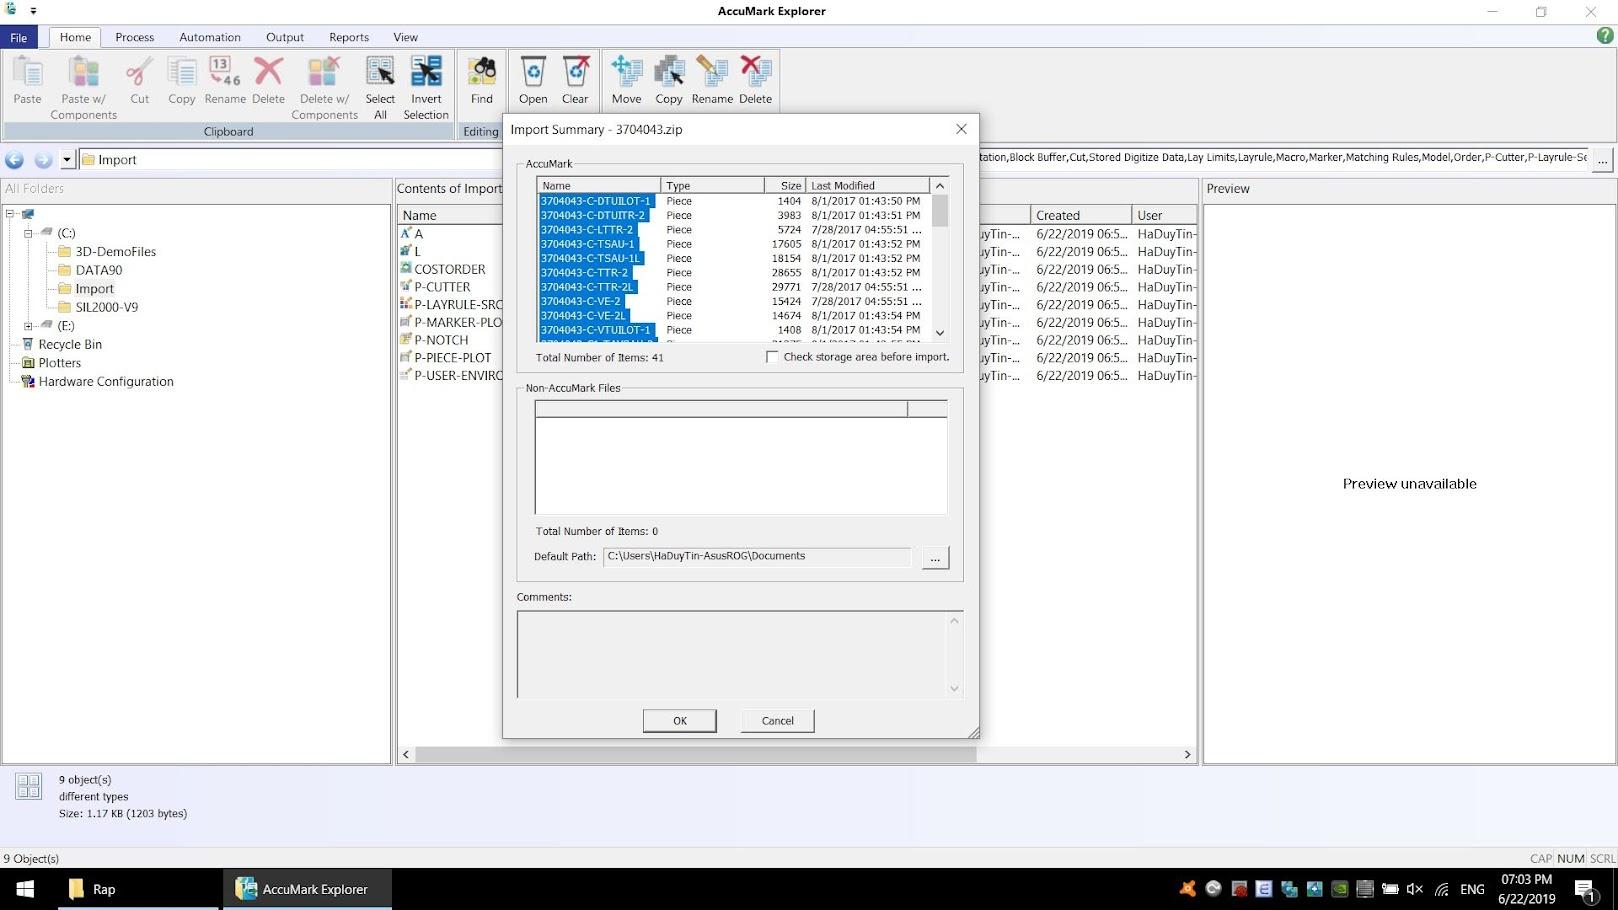 Hướng Dẫn Xử Lý Lỗi Error Unzipping File khi Import Zip Accumark Explorer 6